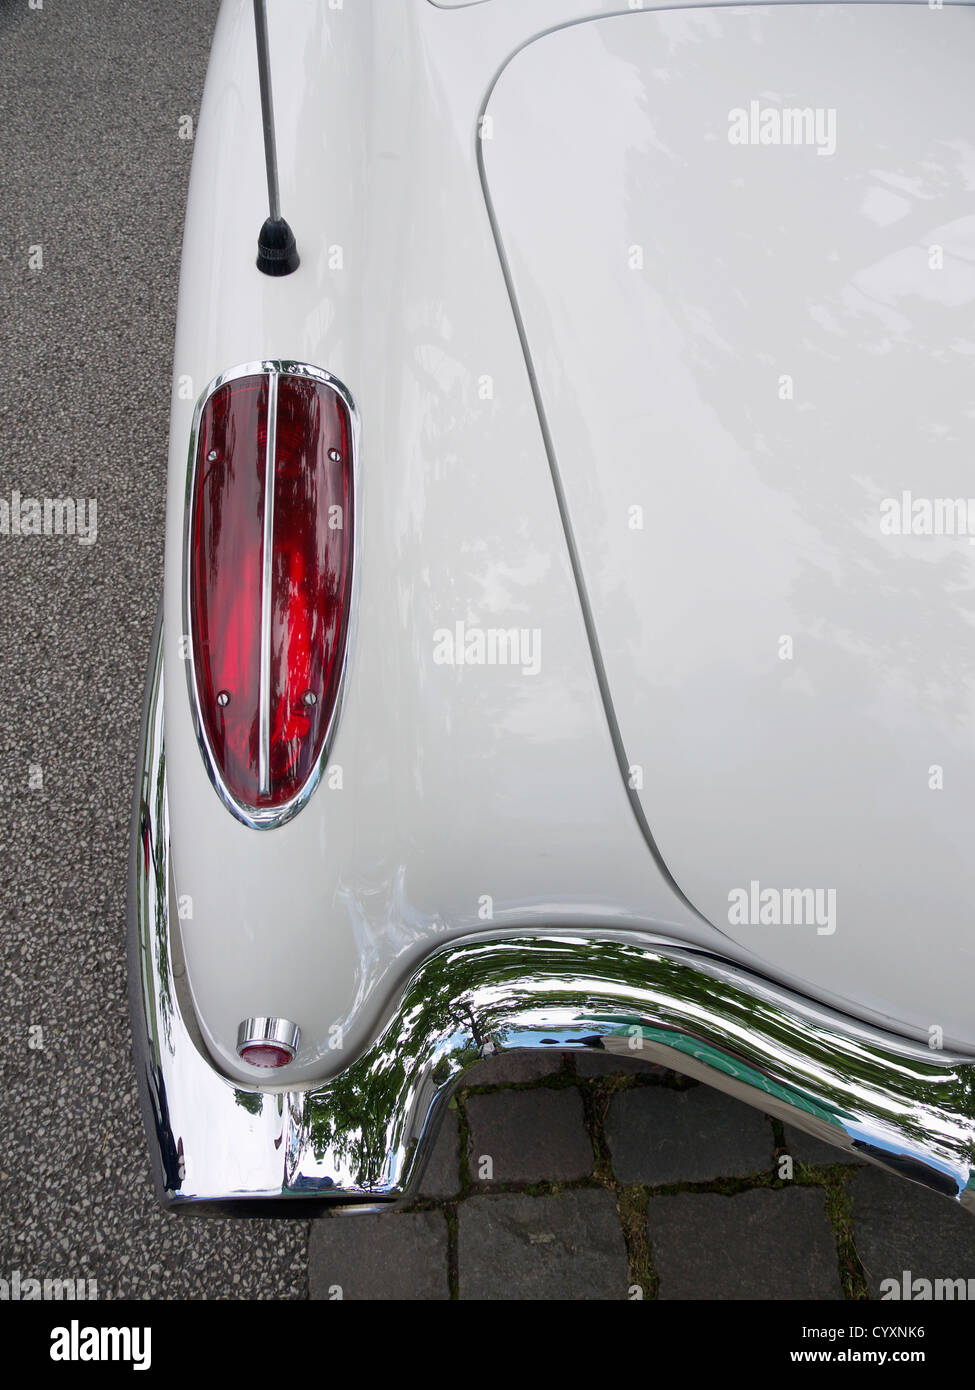 Taillight of white American Chevrolet Corvette veteran car Stock Photo